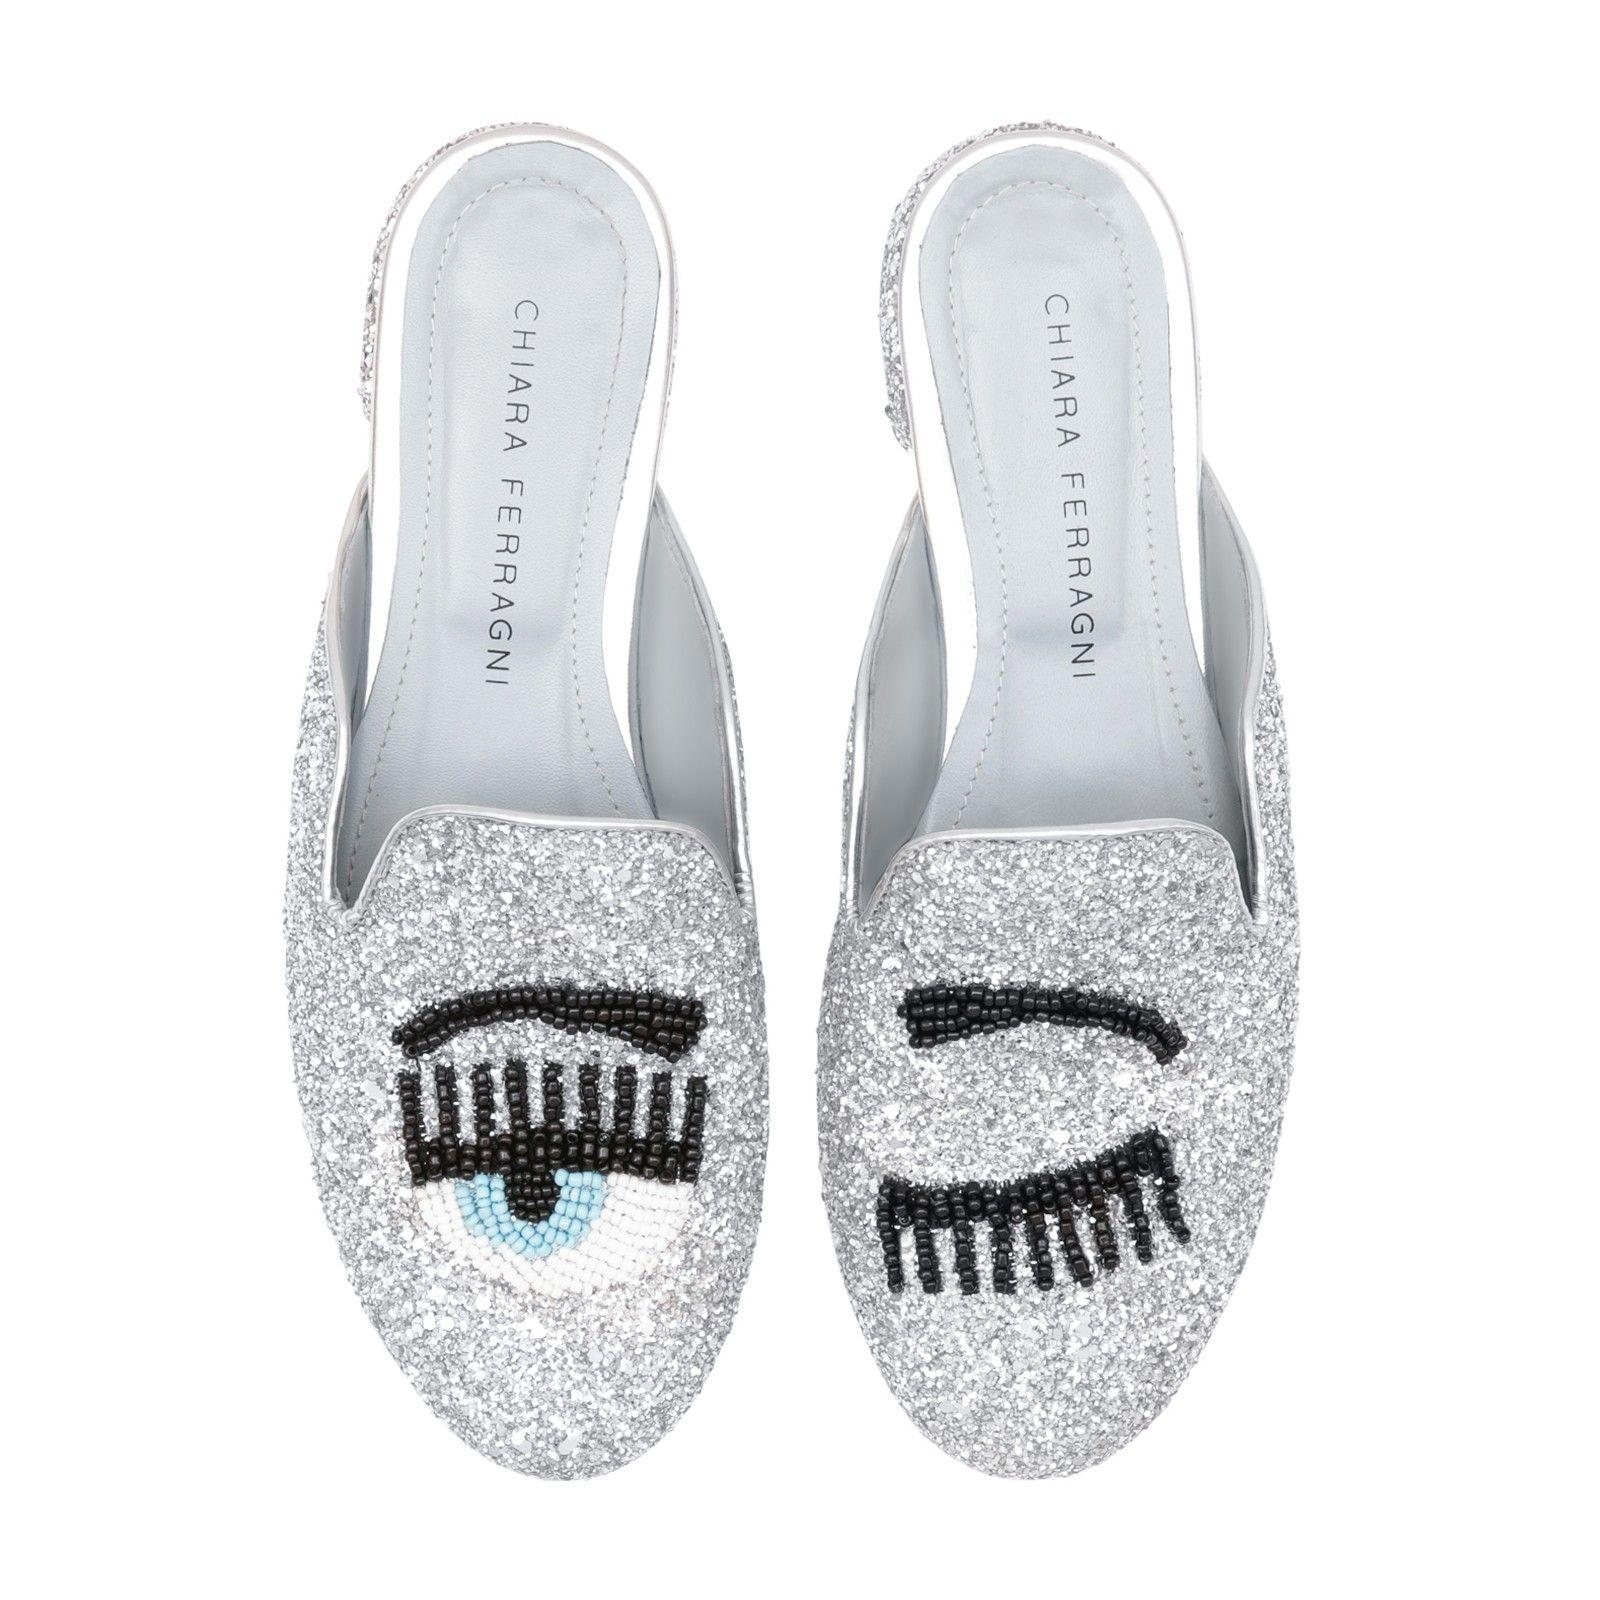 21d05268947 Chiara Ferragni slippers   Accessorize in 2019   Chiara ferragni ...